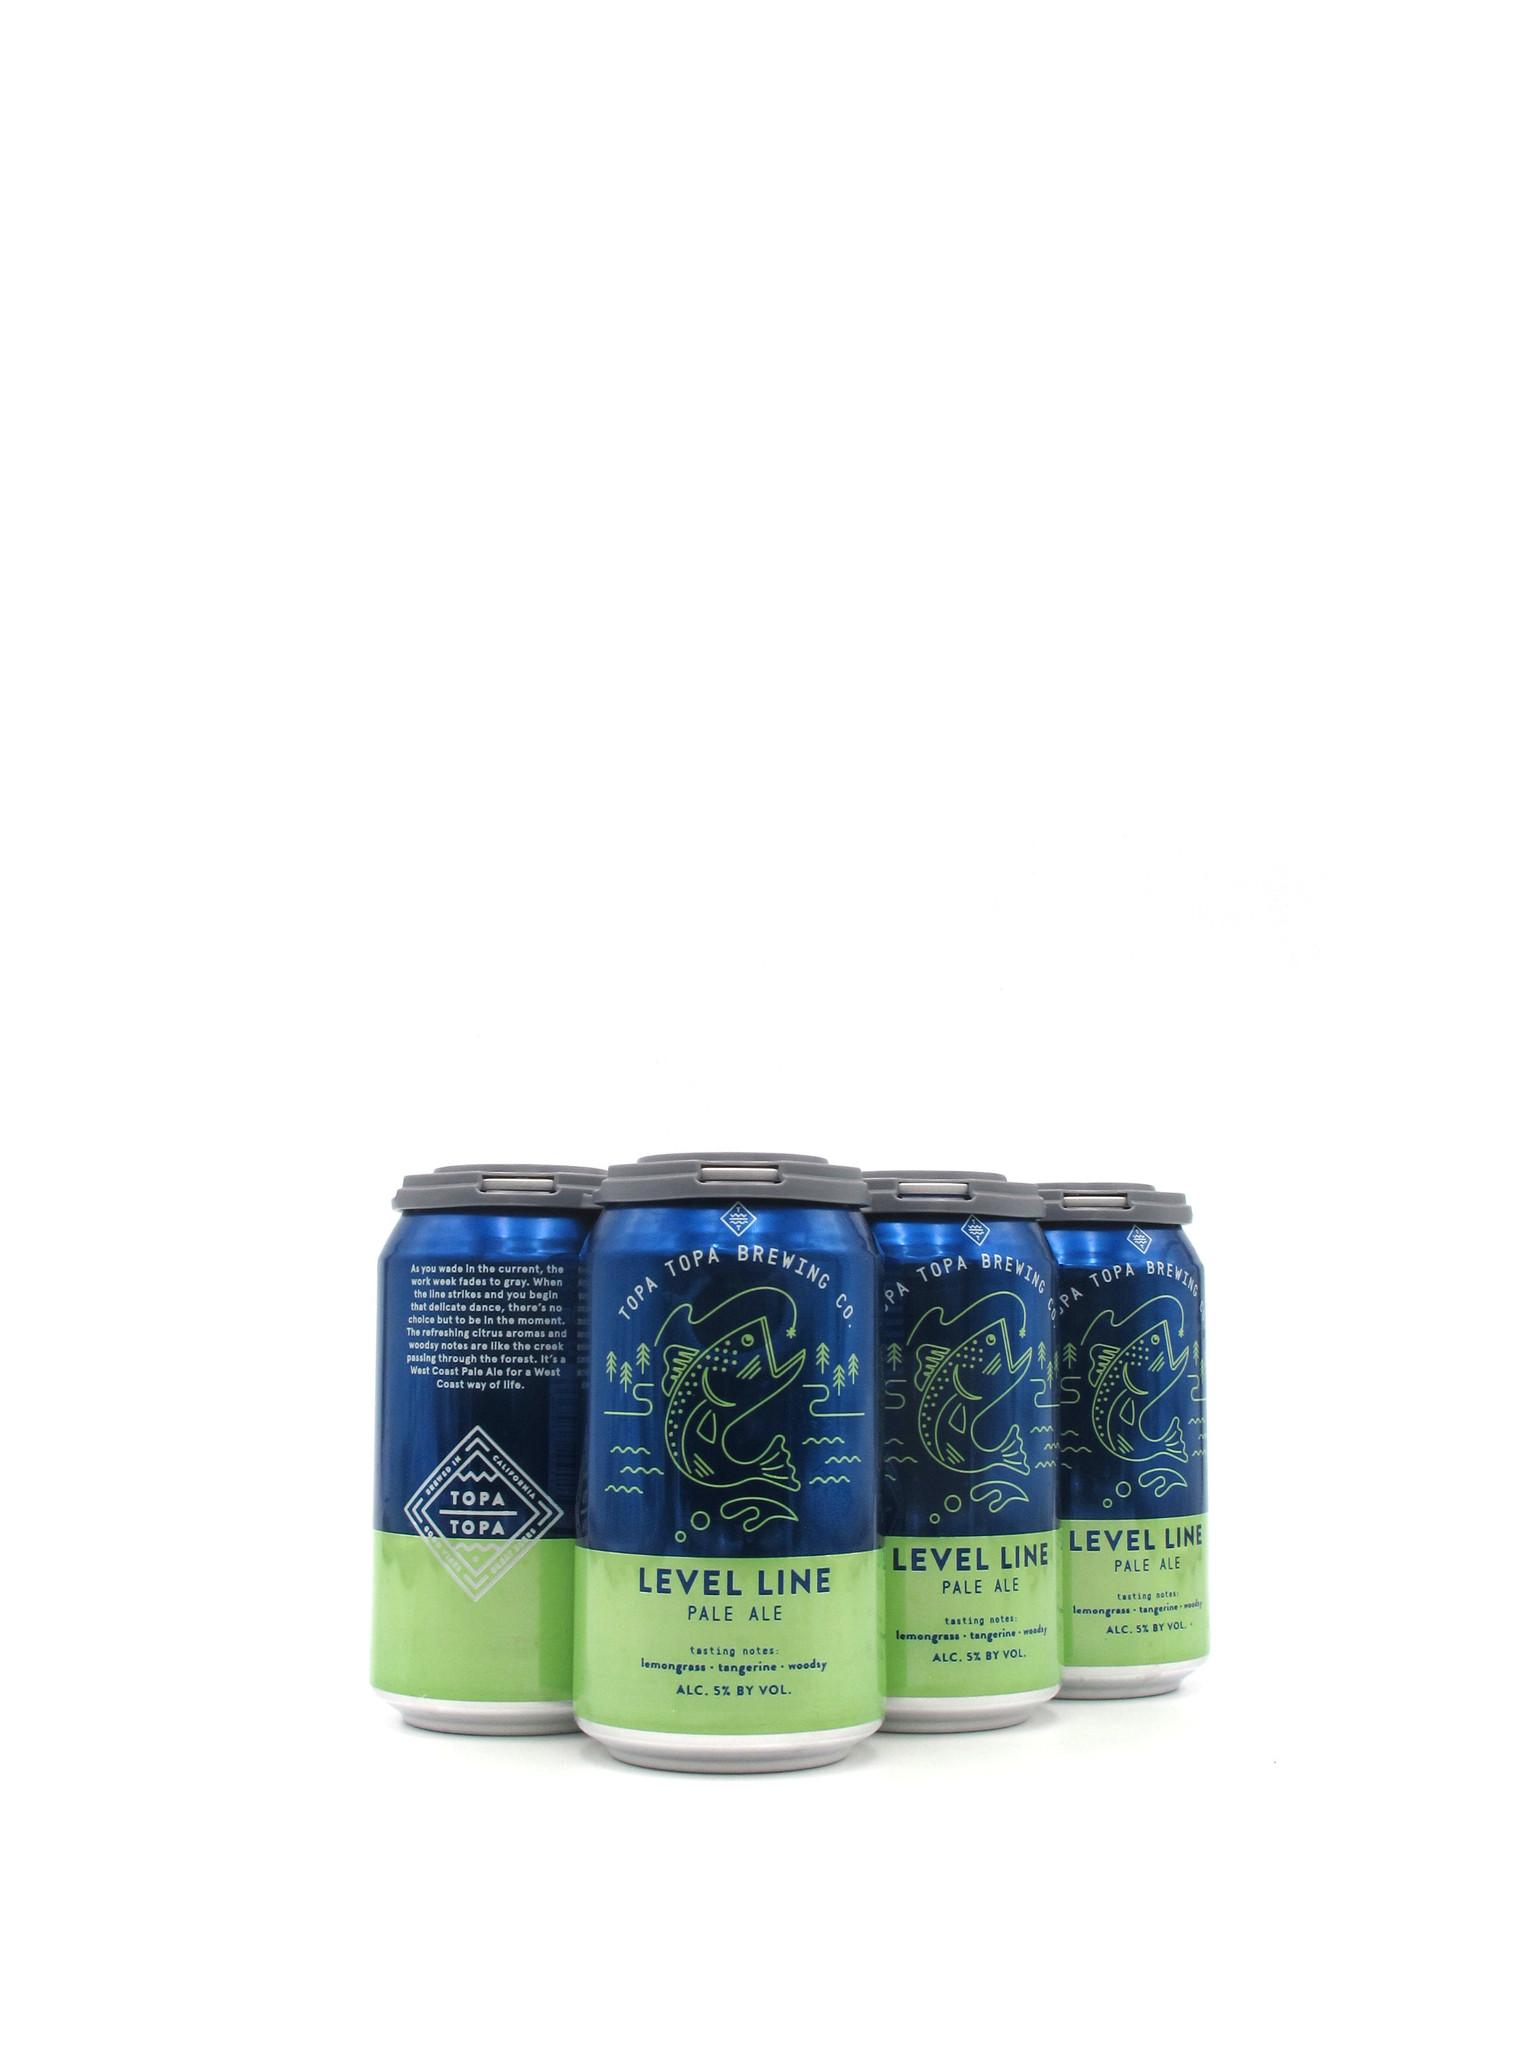 Topa Topa Brewing Co. Topa Topa Brewing Co. Level Line Pale Ale 12oz 6pk